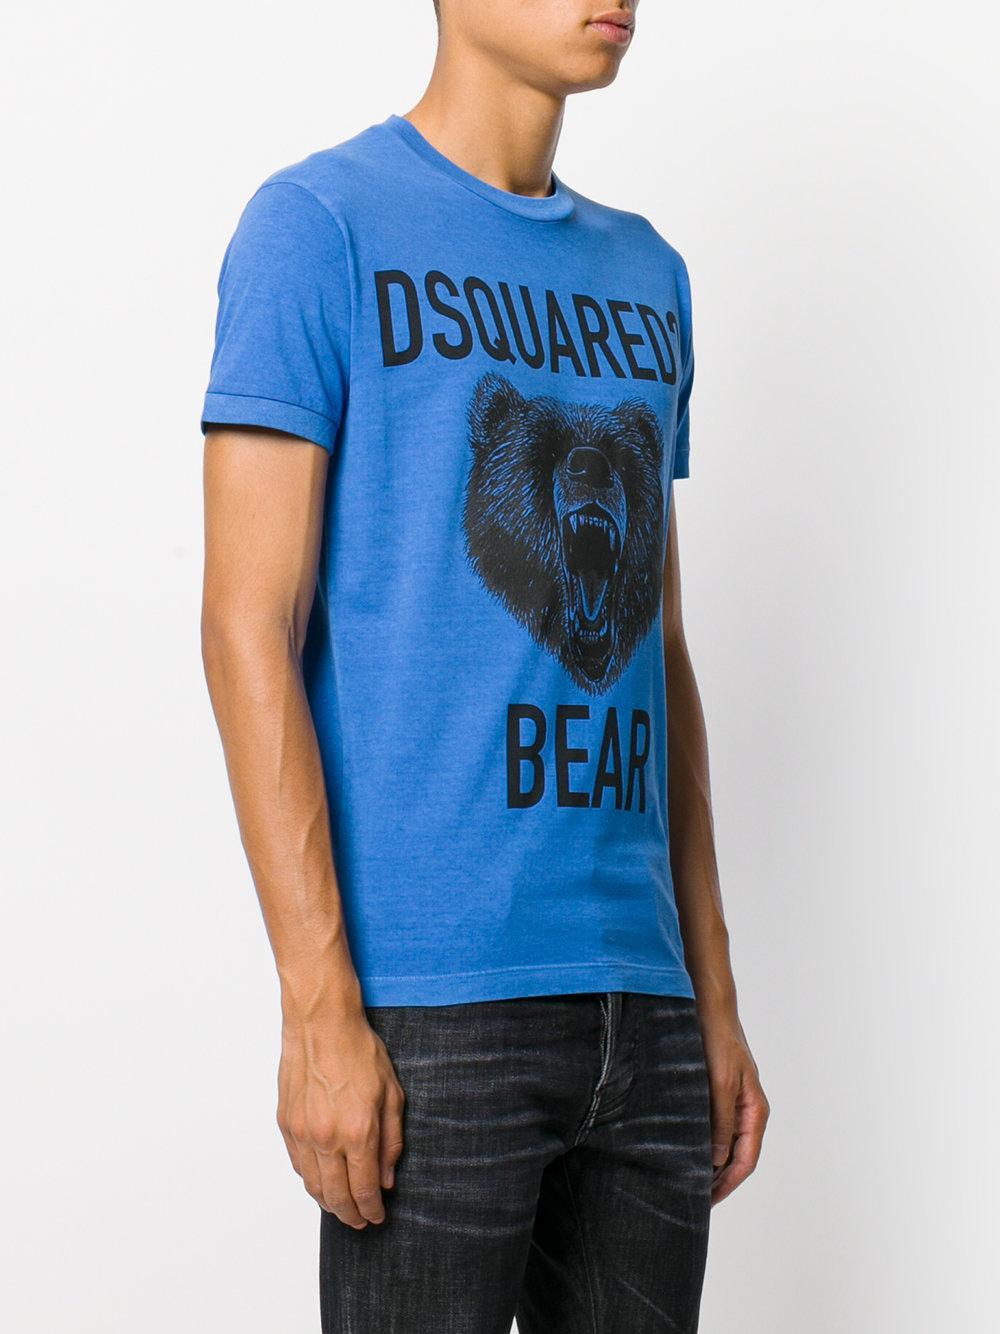 Dsquared 178 Bear Print T Shirt In Blue For Men Lyst